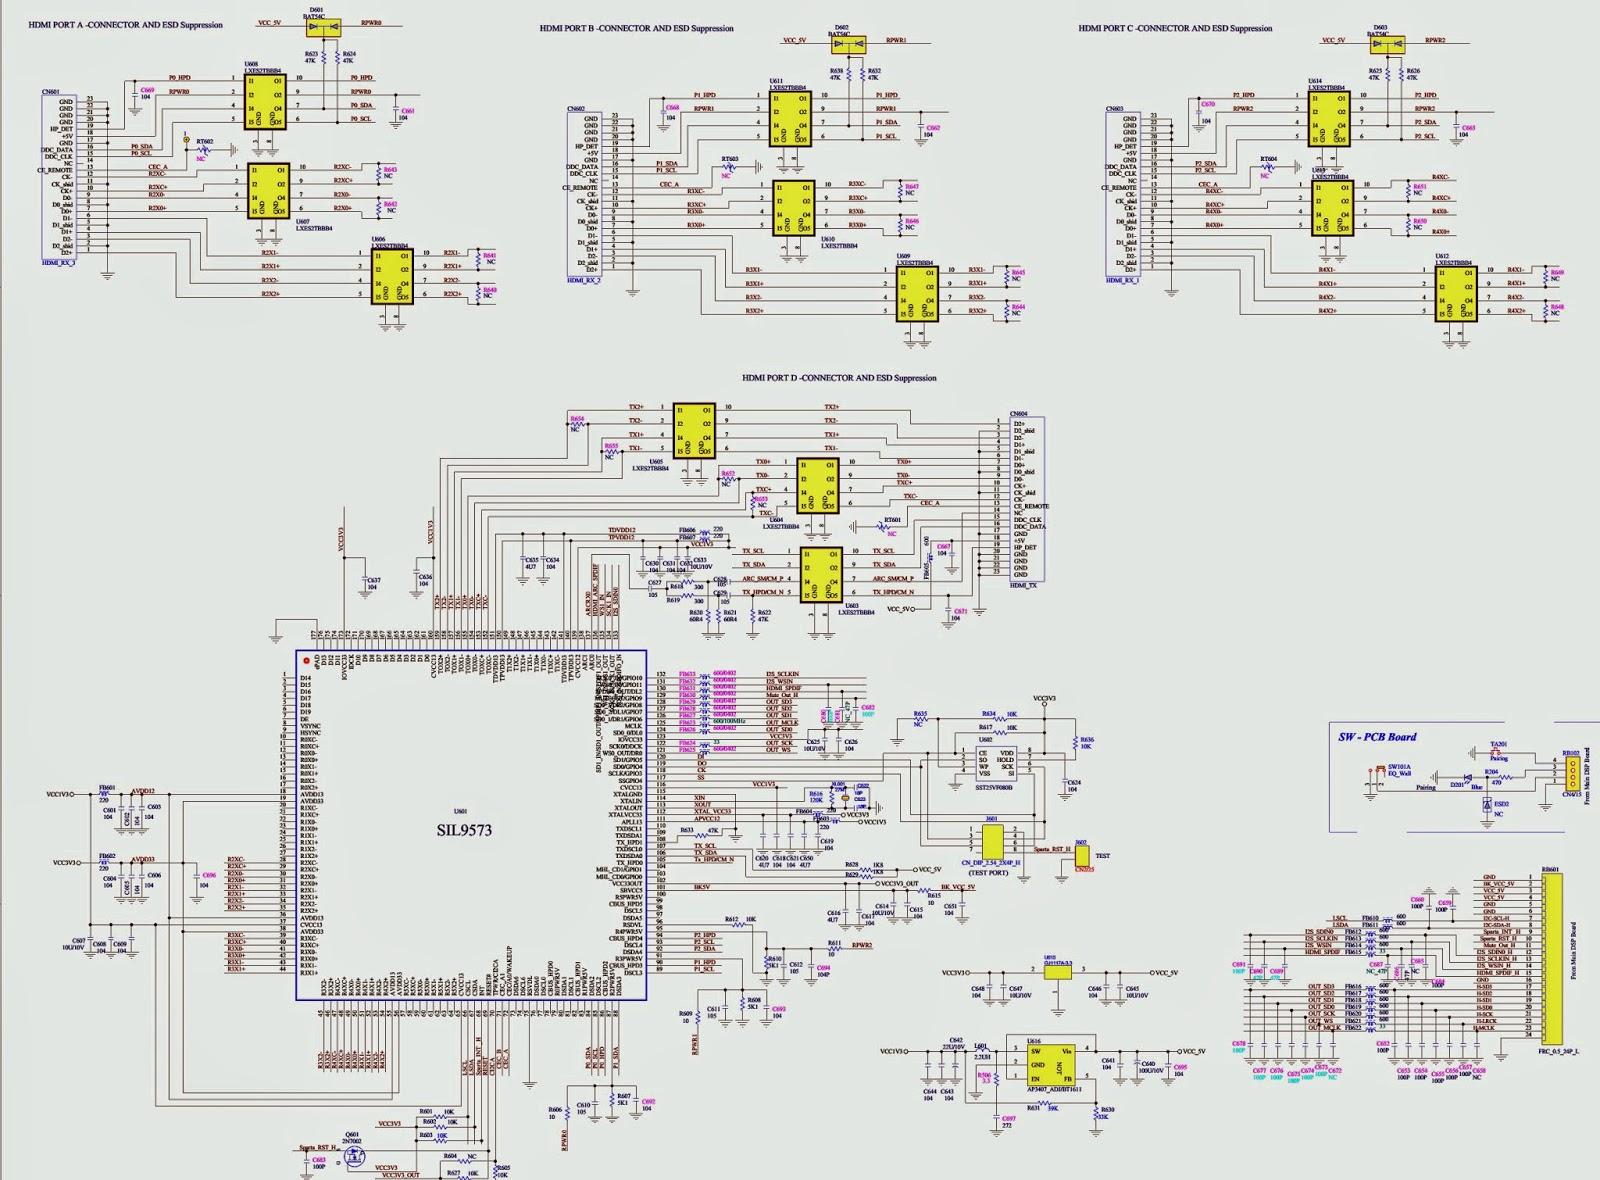 sonos sound bar wiring diagram 2017 jeep wrangler subwoofer get free image about